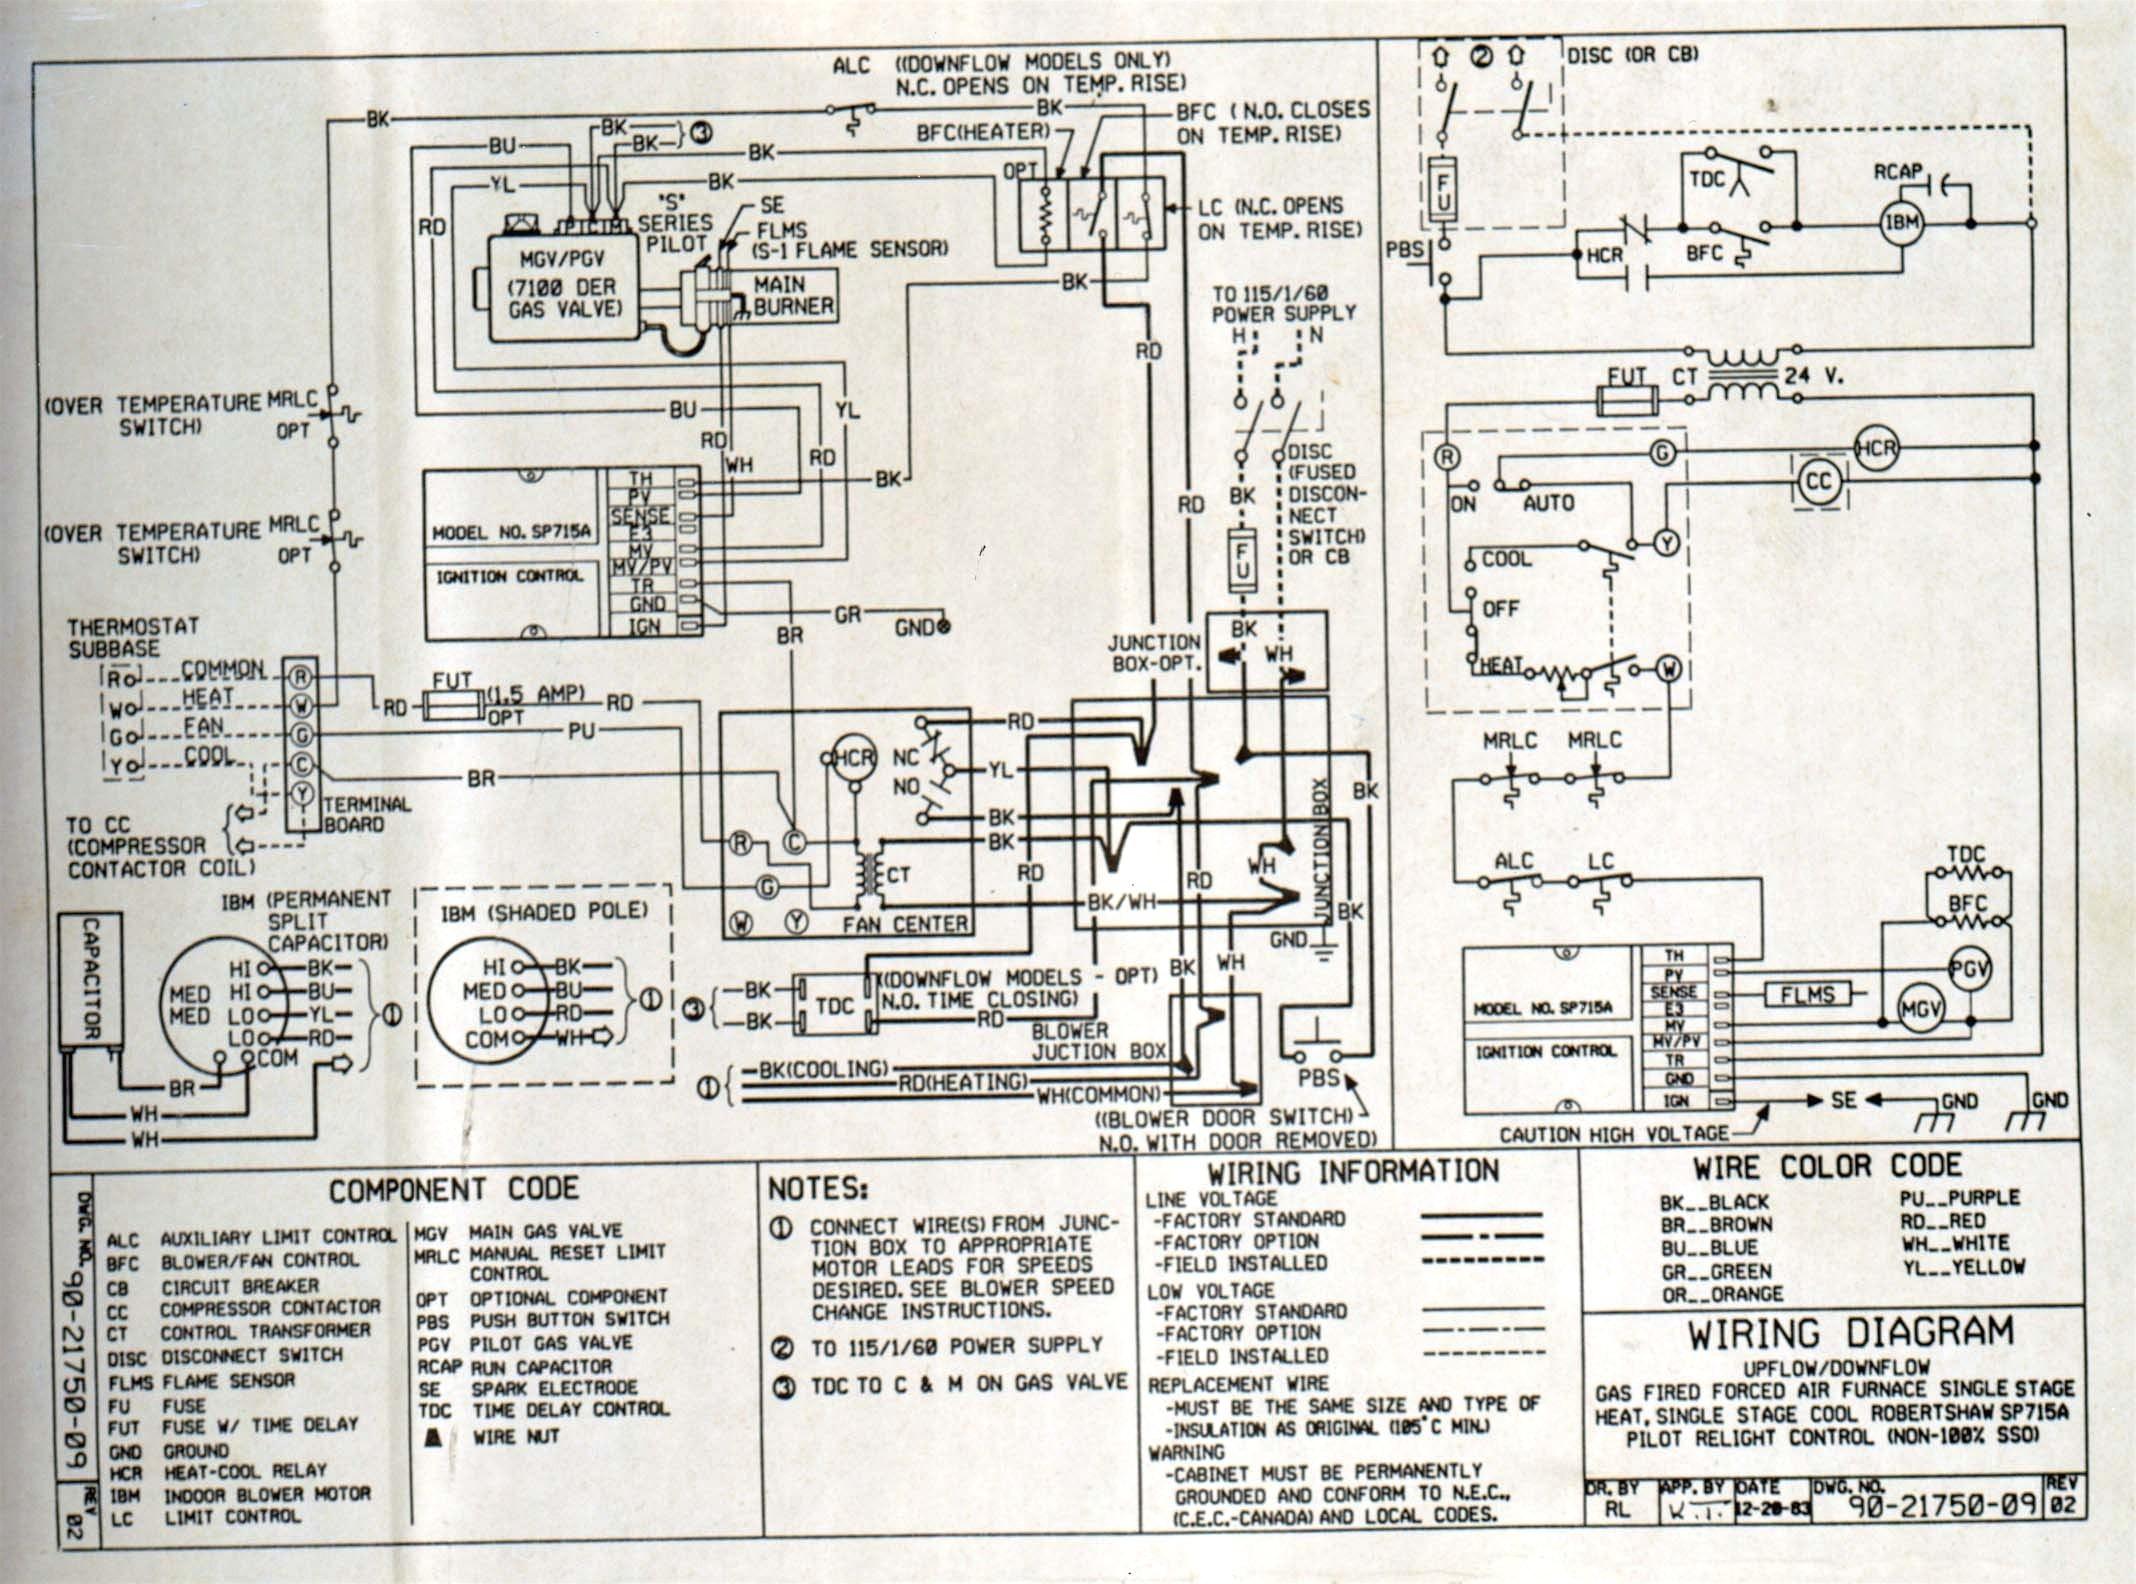 goodman air handler wiring diagram unique ameristar heat pump wiring diagram new goodman air handler wiring of goodman air handler wiring diagram